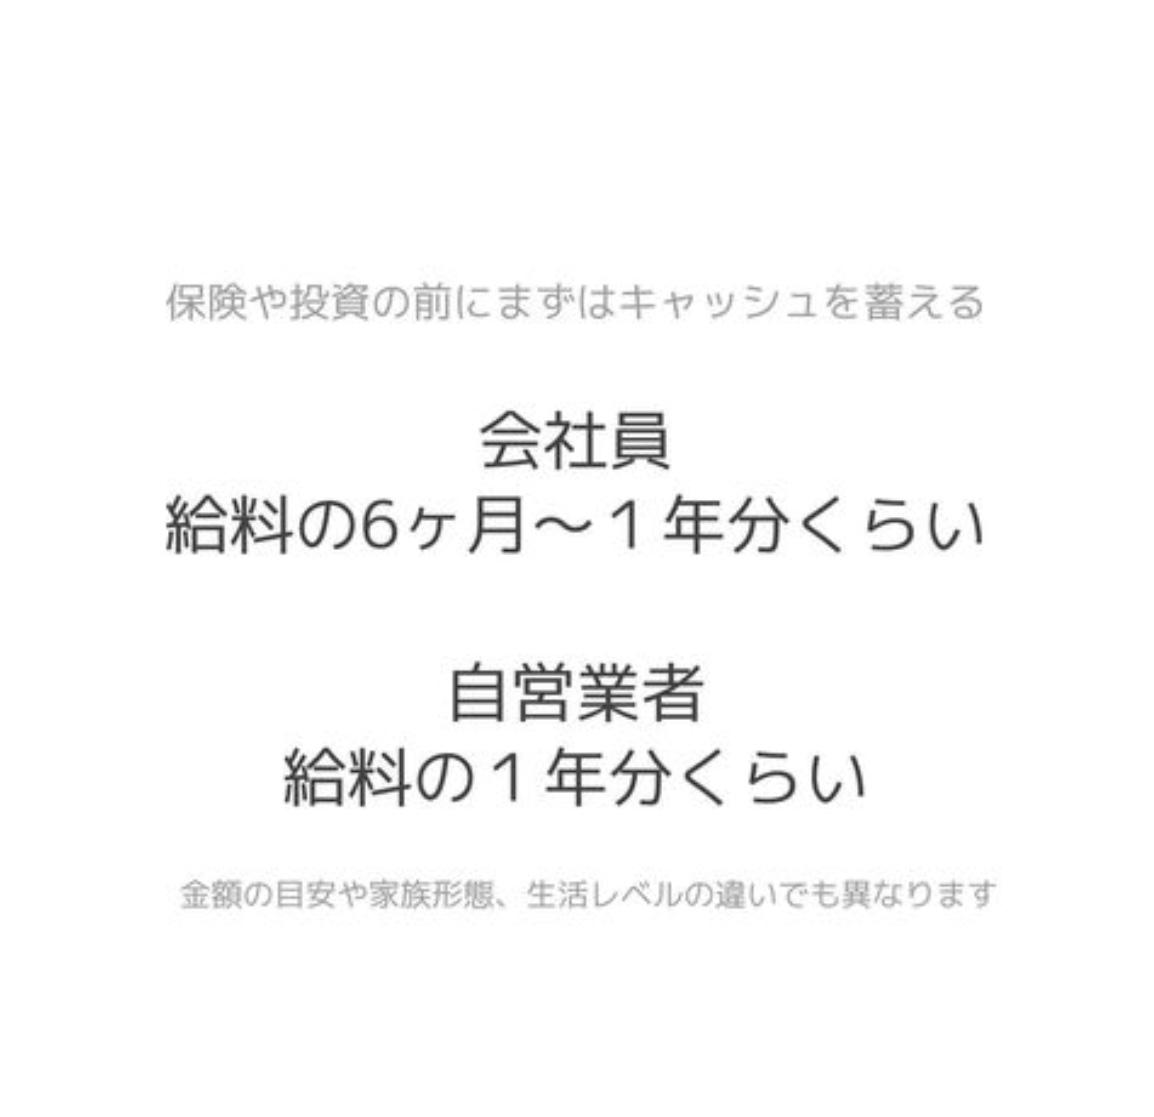 f:id:hiconail:20210124115506j:plain